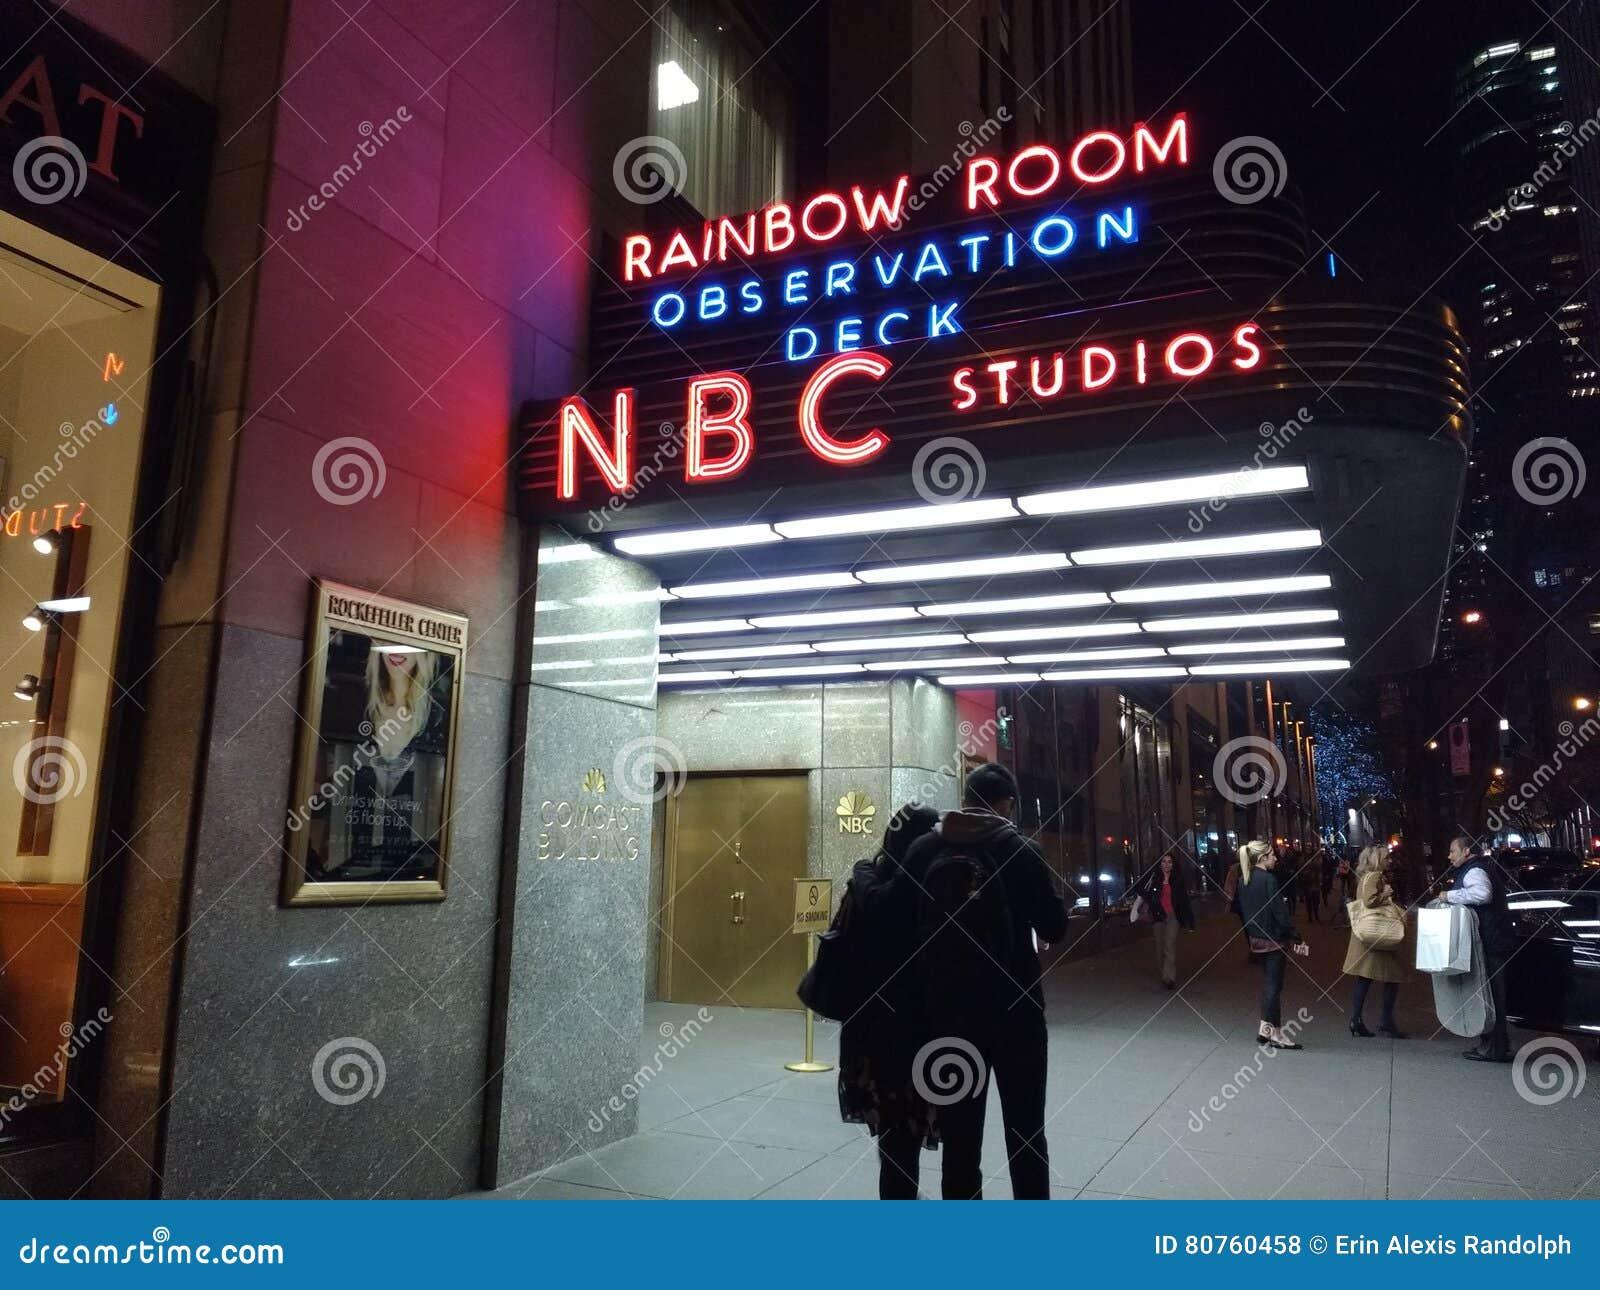 Nbc Studios Rainbow Room Observation Deck 30 Rockefeller Plaza Nyc Usa Editorial Stock Photo Image Of Entrances Attractions 80760458